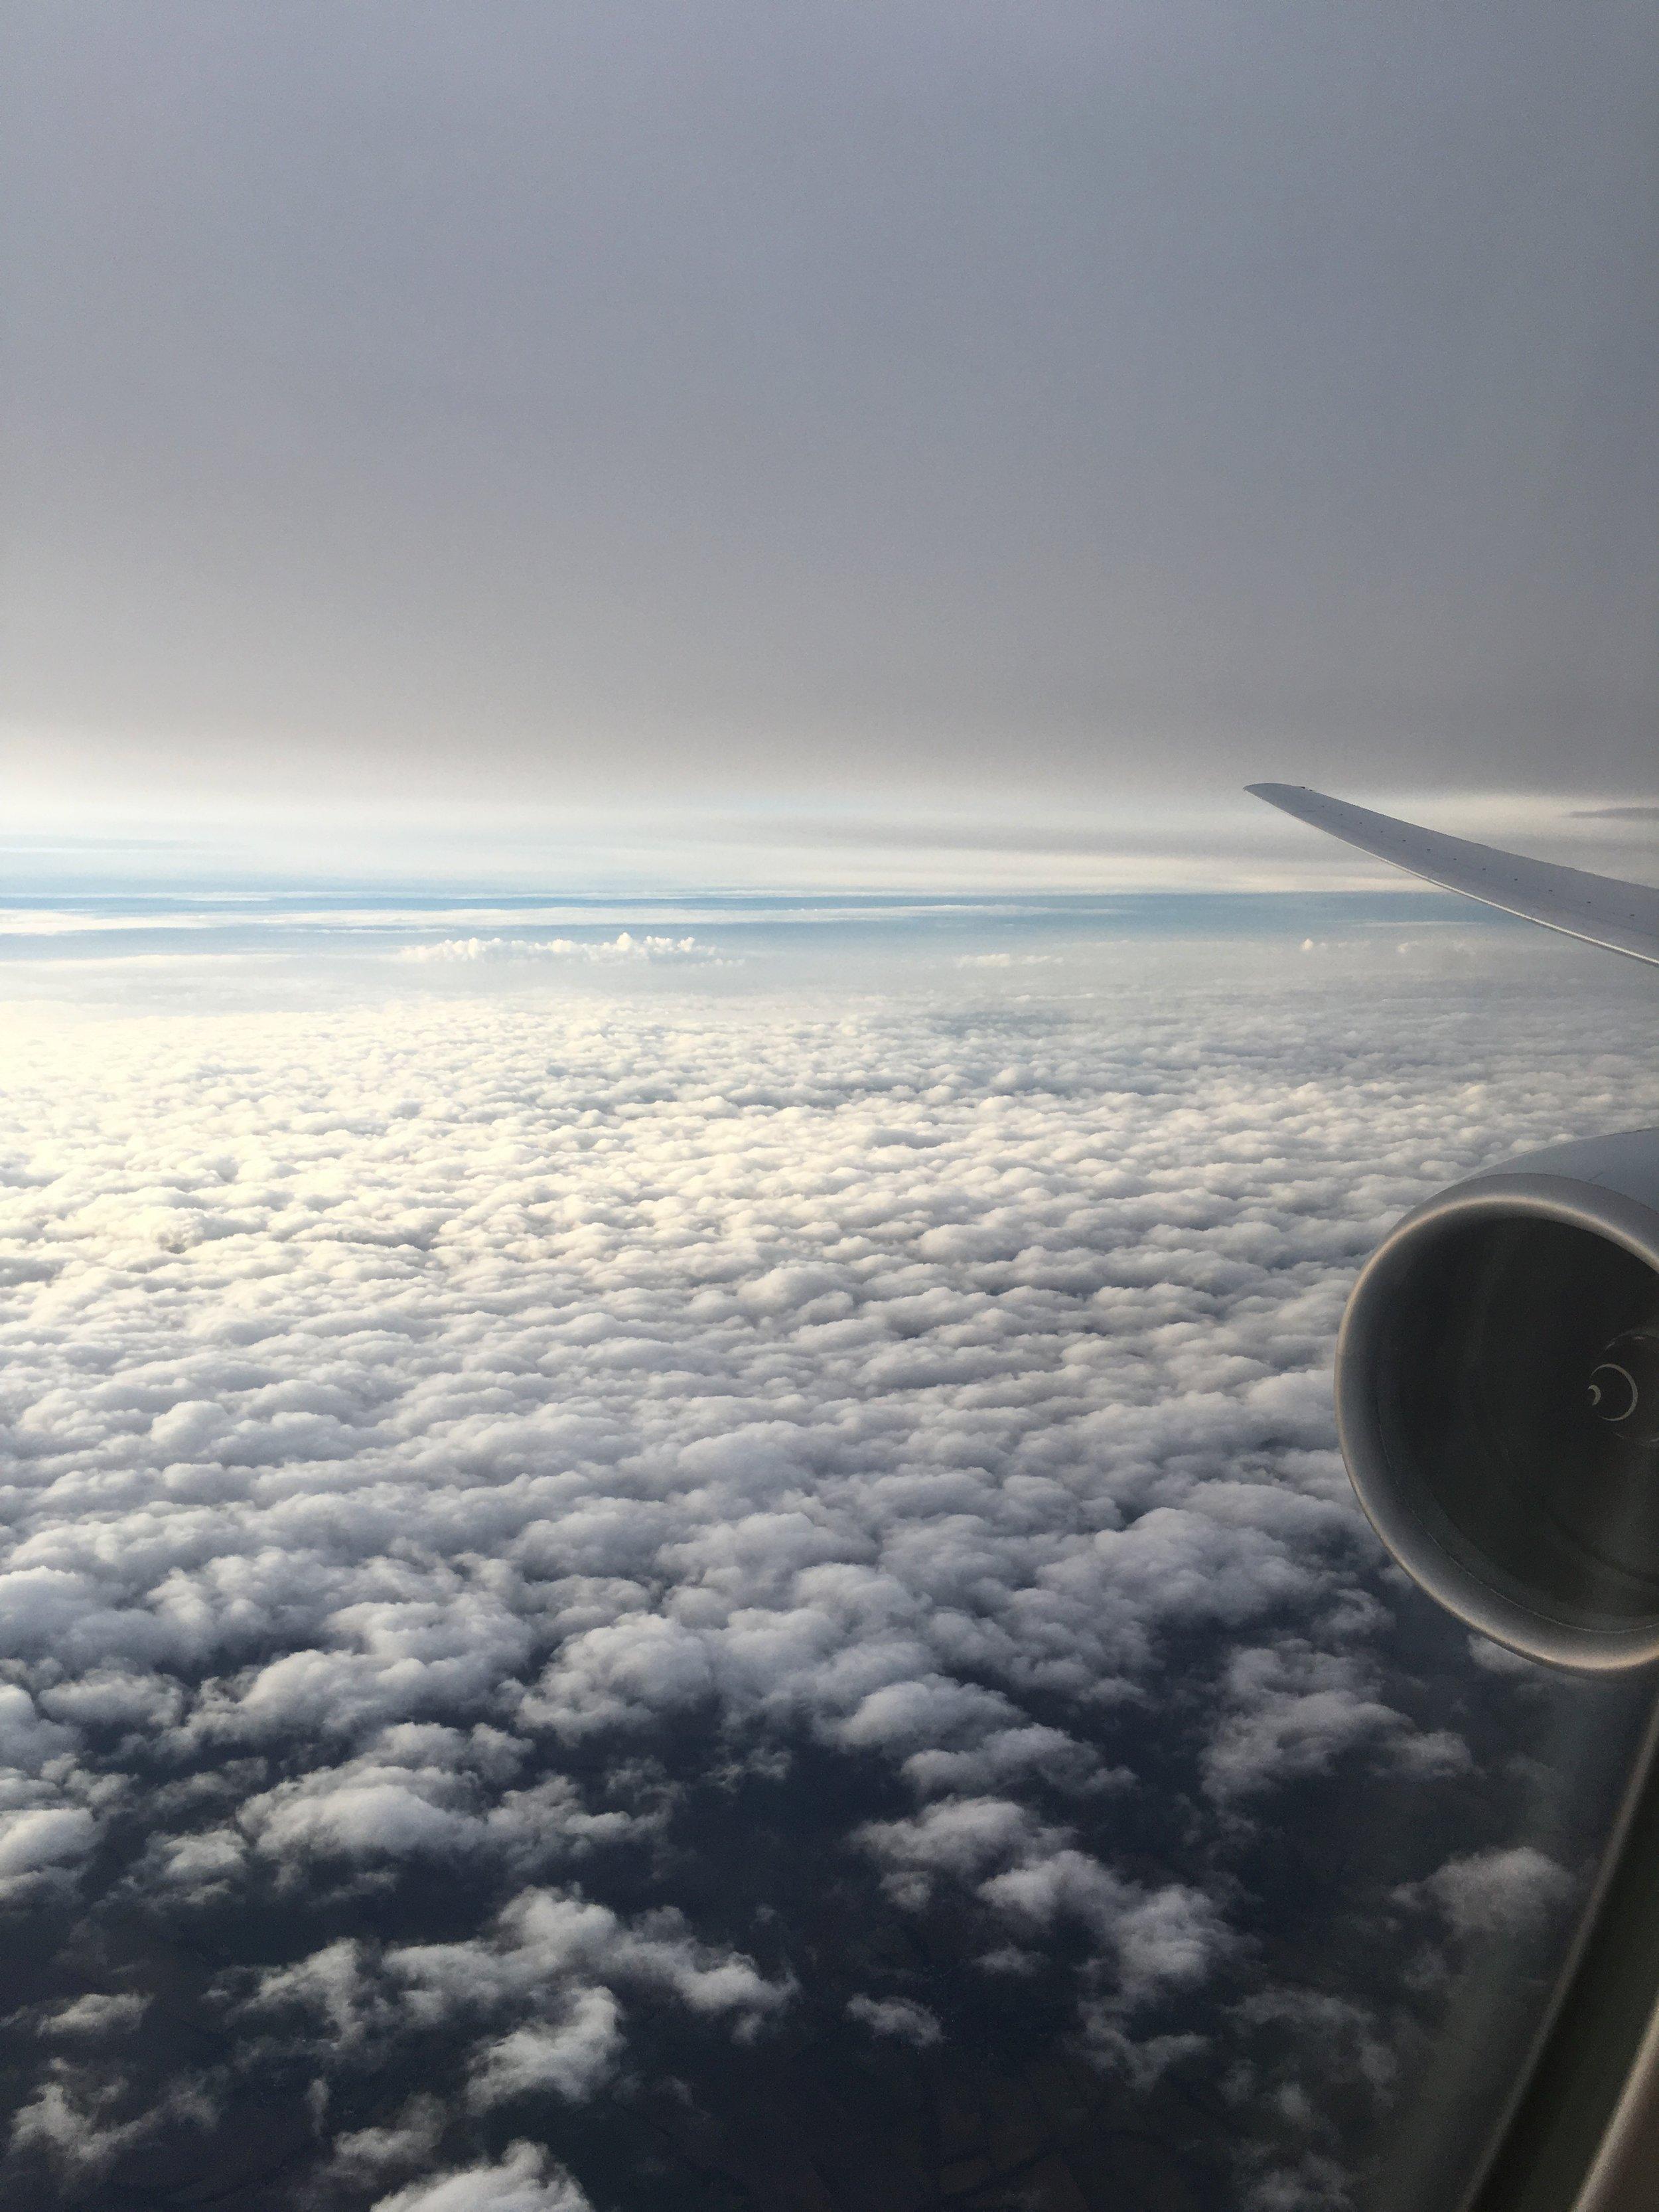 Descending into London